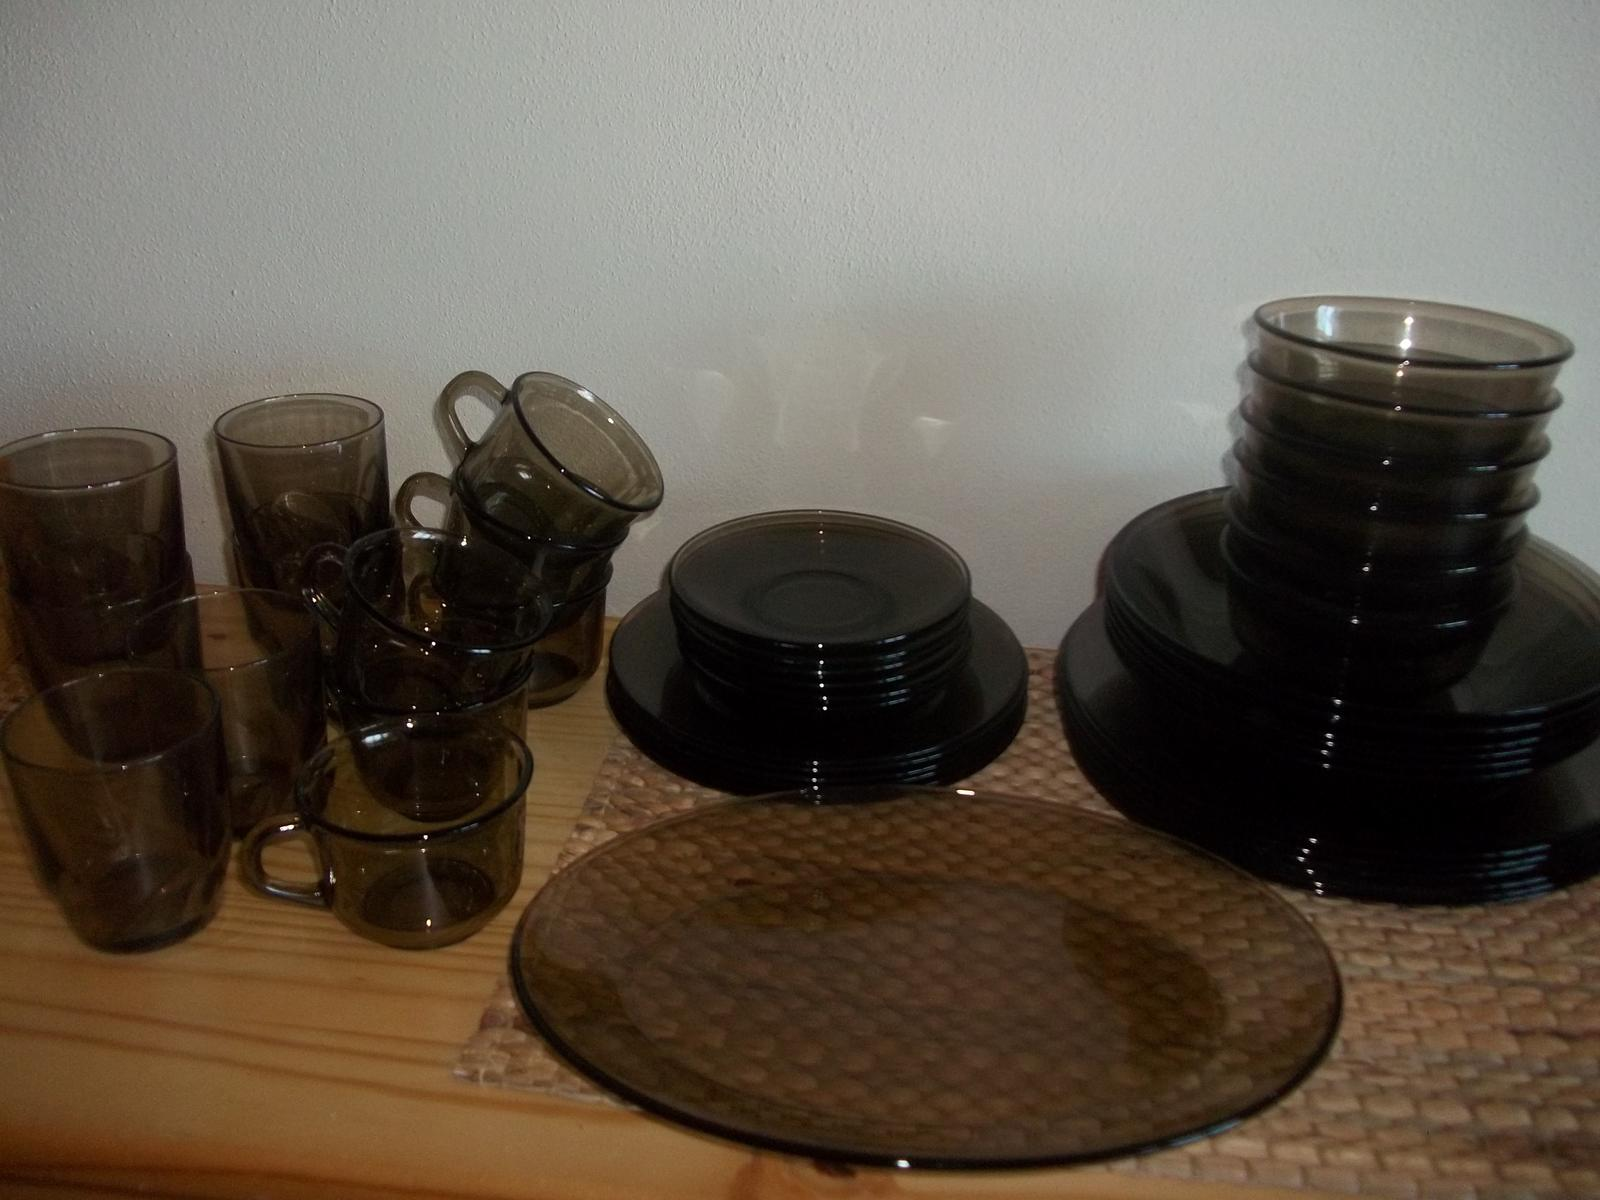 43-dielna jedálenská súprava z hnedého skla - Obrázok č. 1